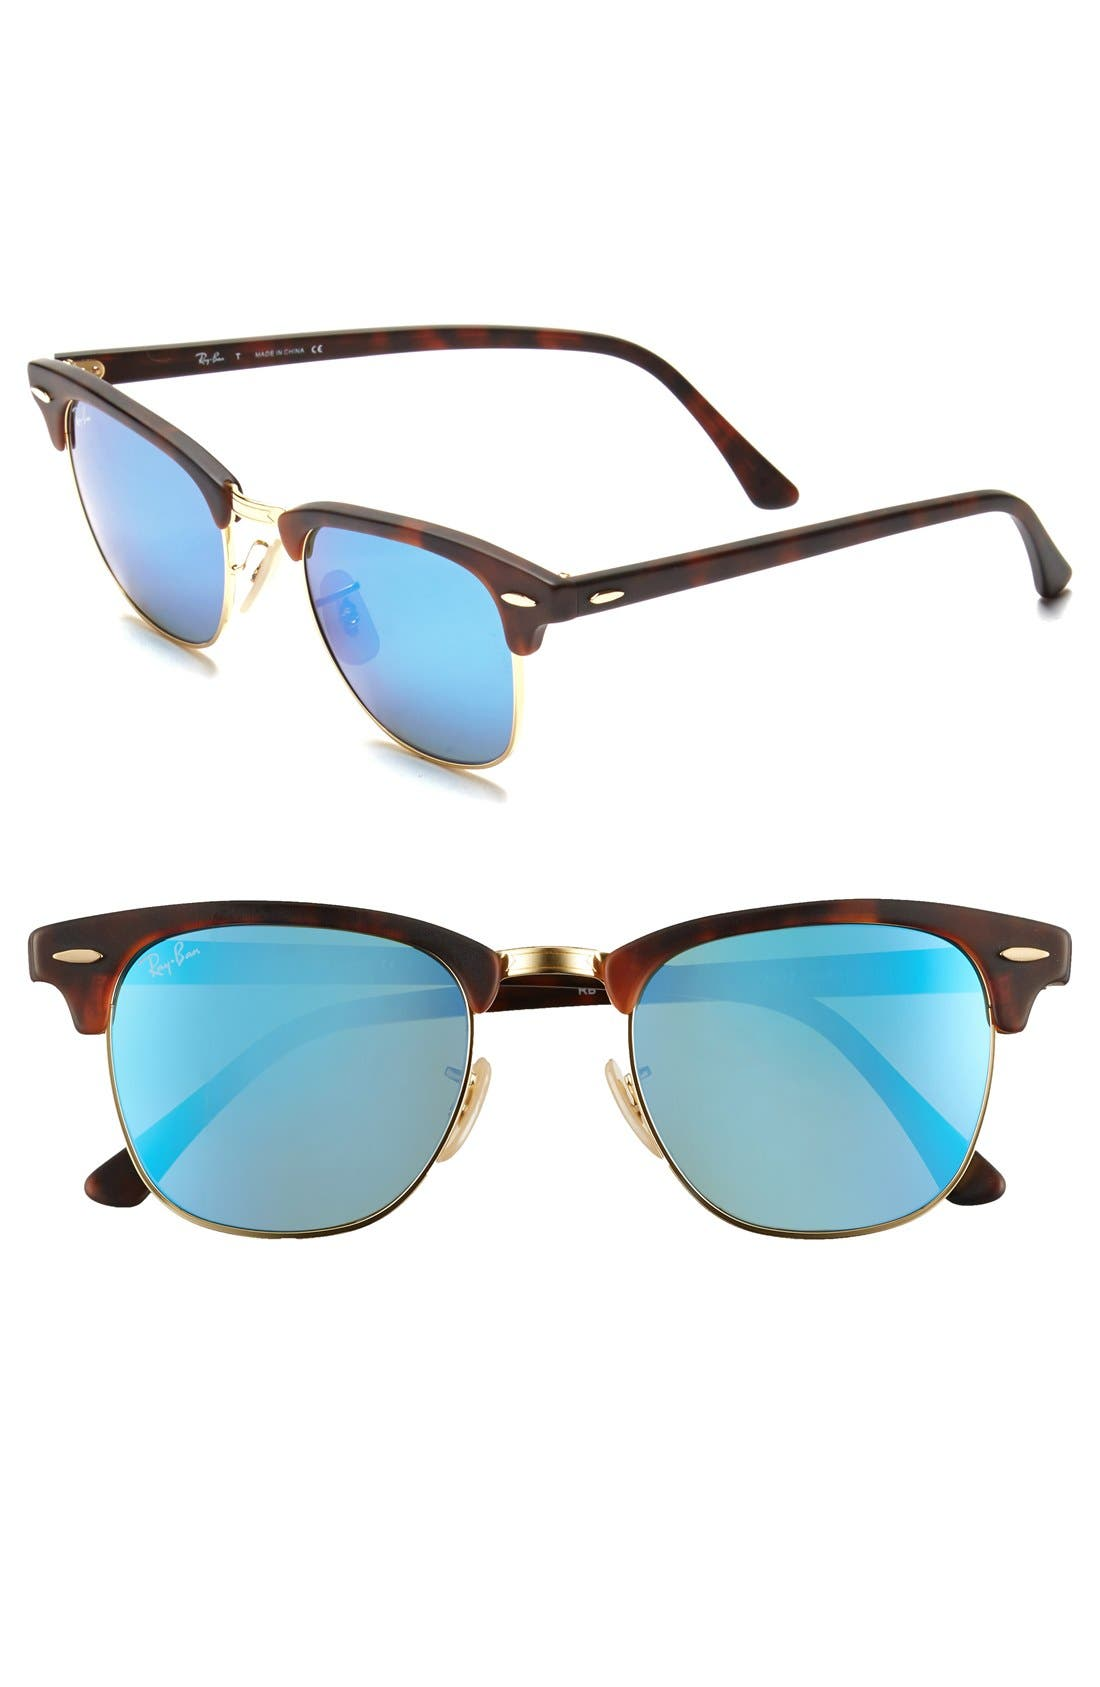 Flash Clubmaster 51mm Sunglasses,                         Main,                         color, TORTOISE/ BLUE MIRROR